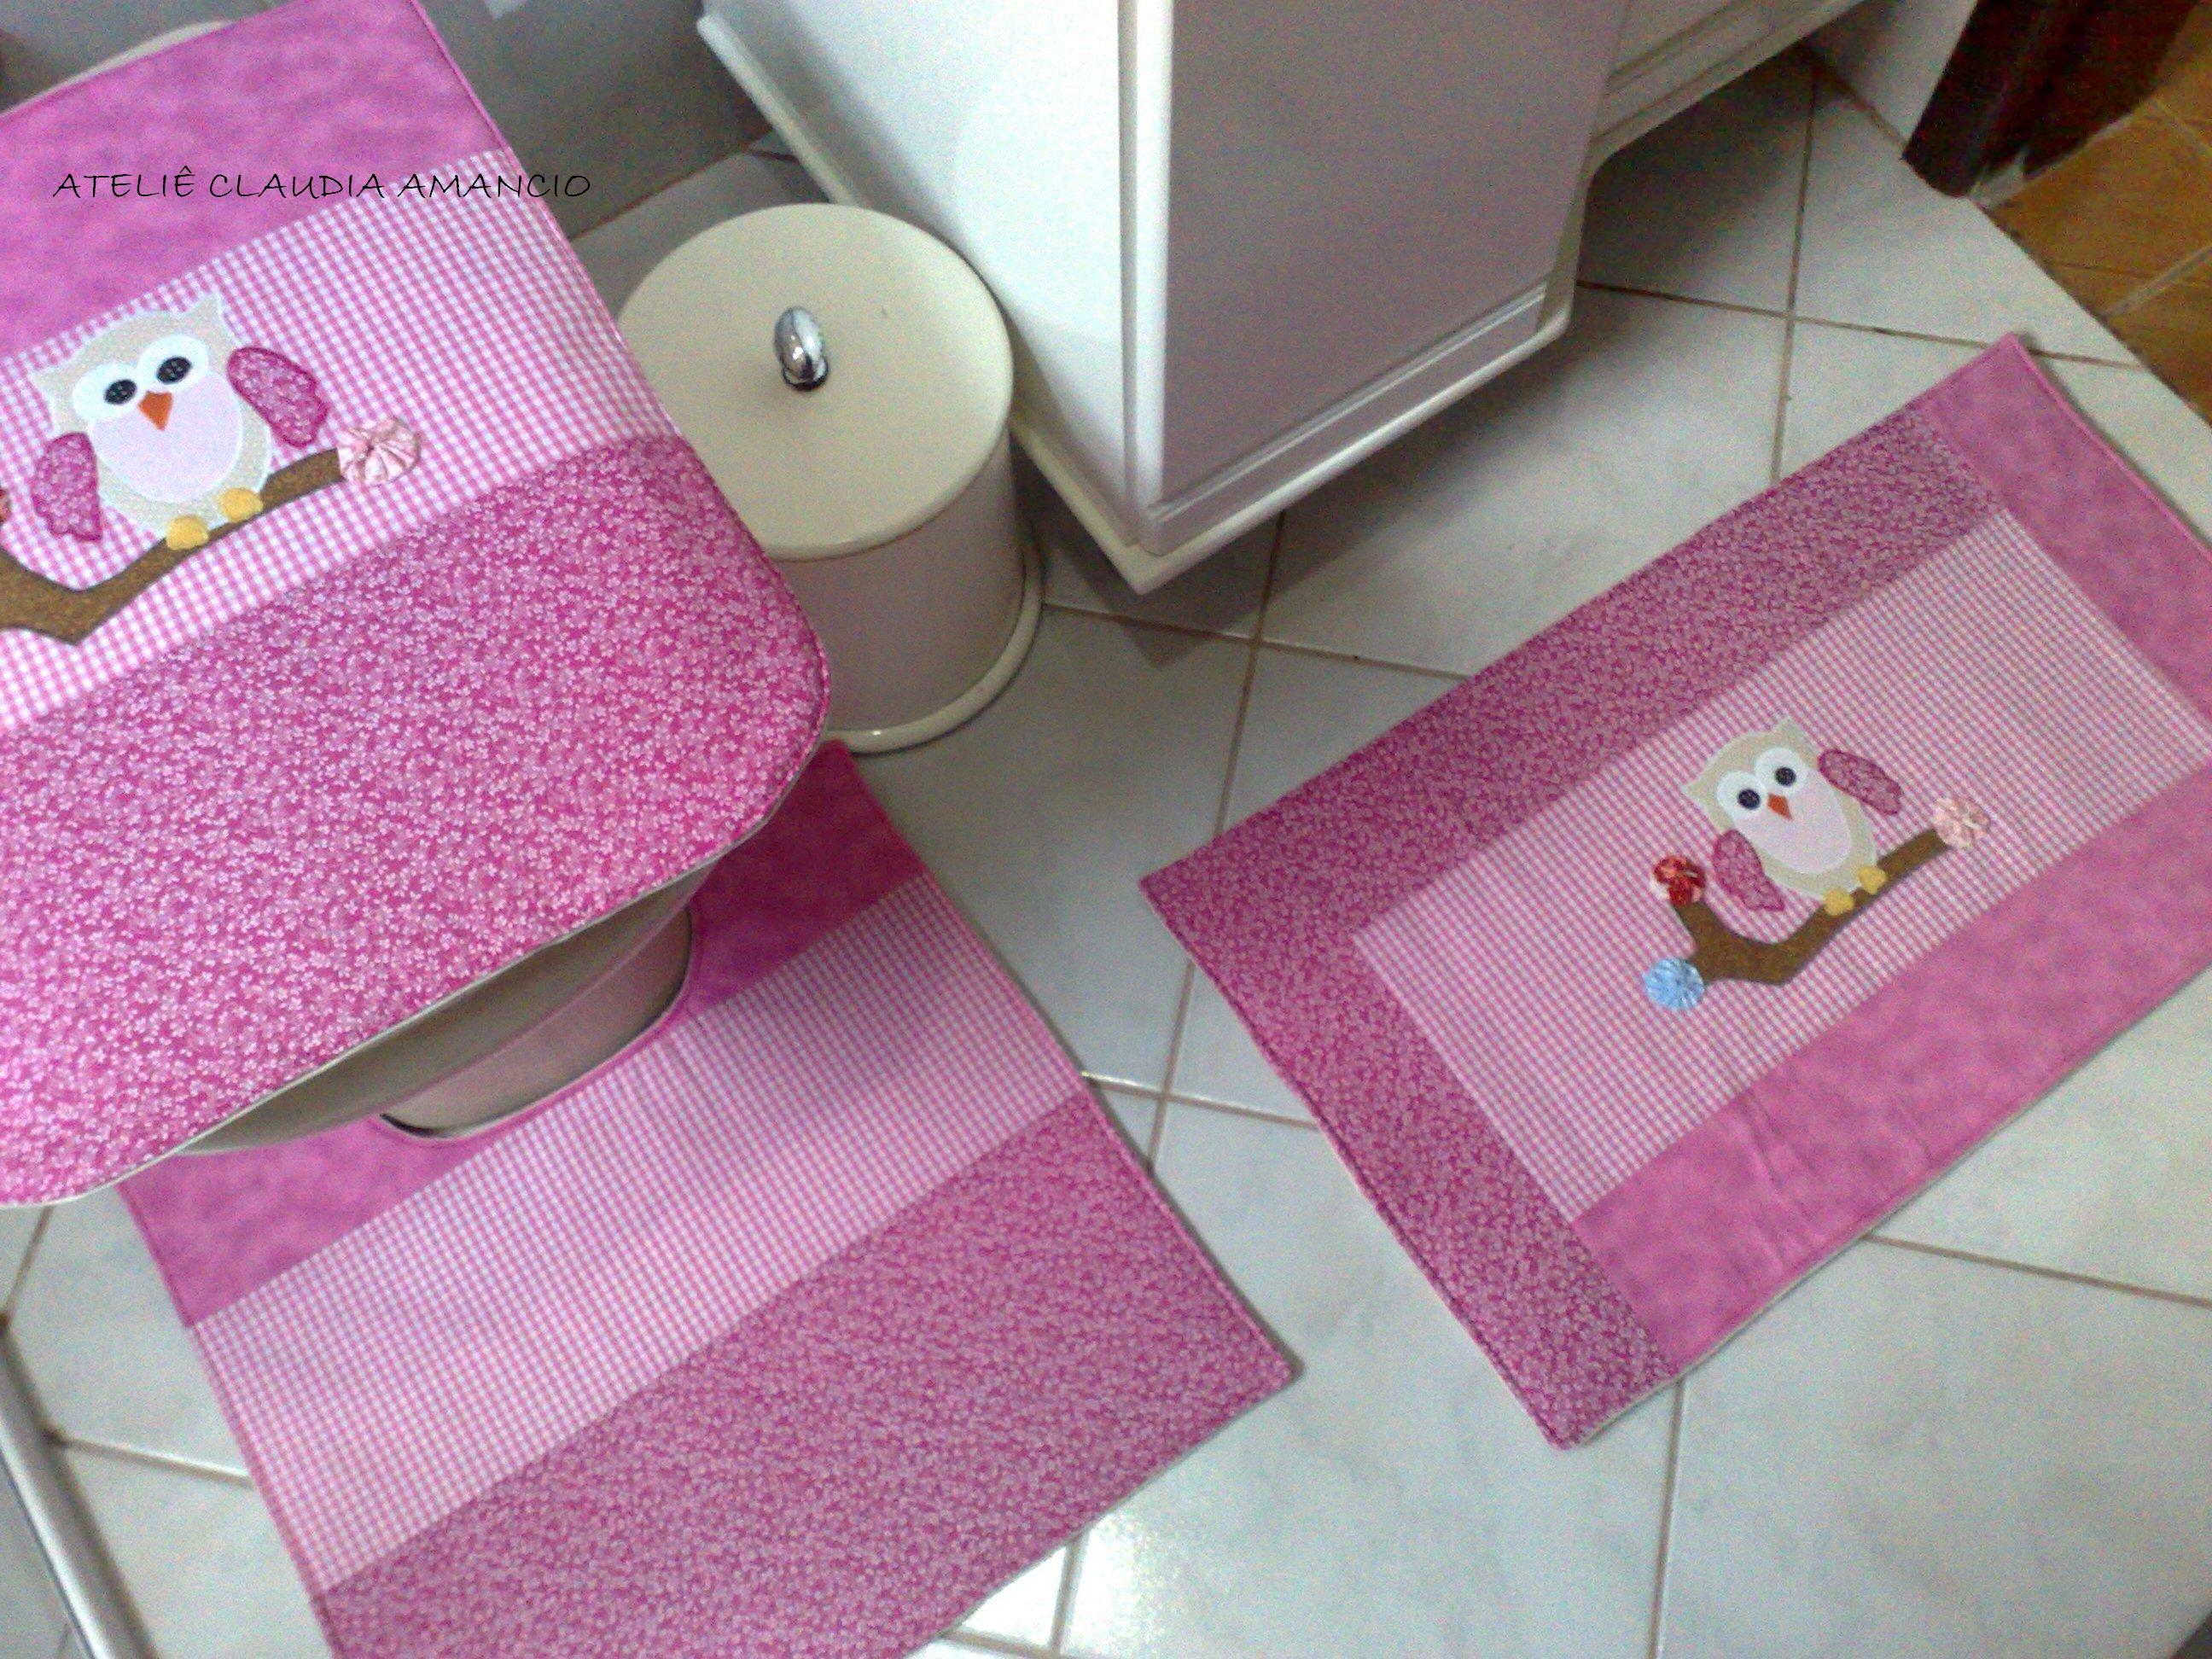 Tapete banheiro hello kitty : Pin toalha de banho hello kitty na janela nileve artes